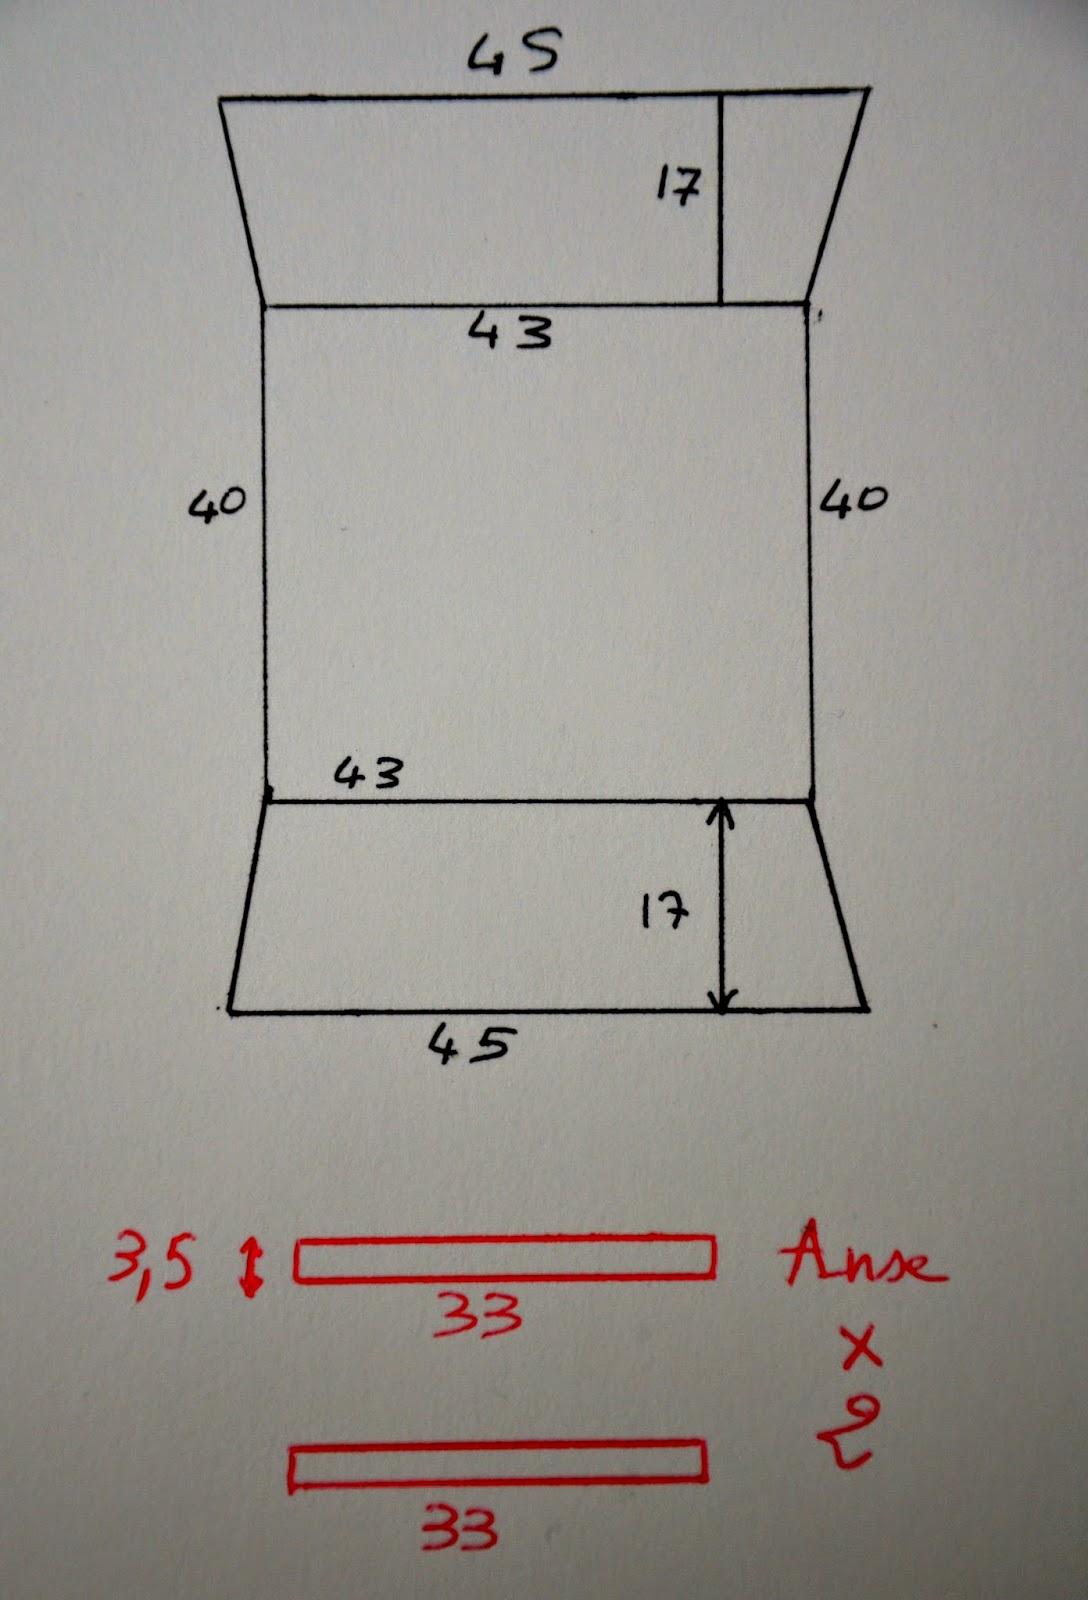 la petite verri re le sac tarte tuto inside. Black Bedroom Furniture Sets. Home Design Ideas